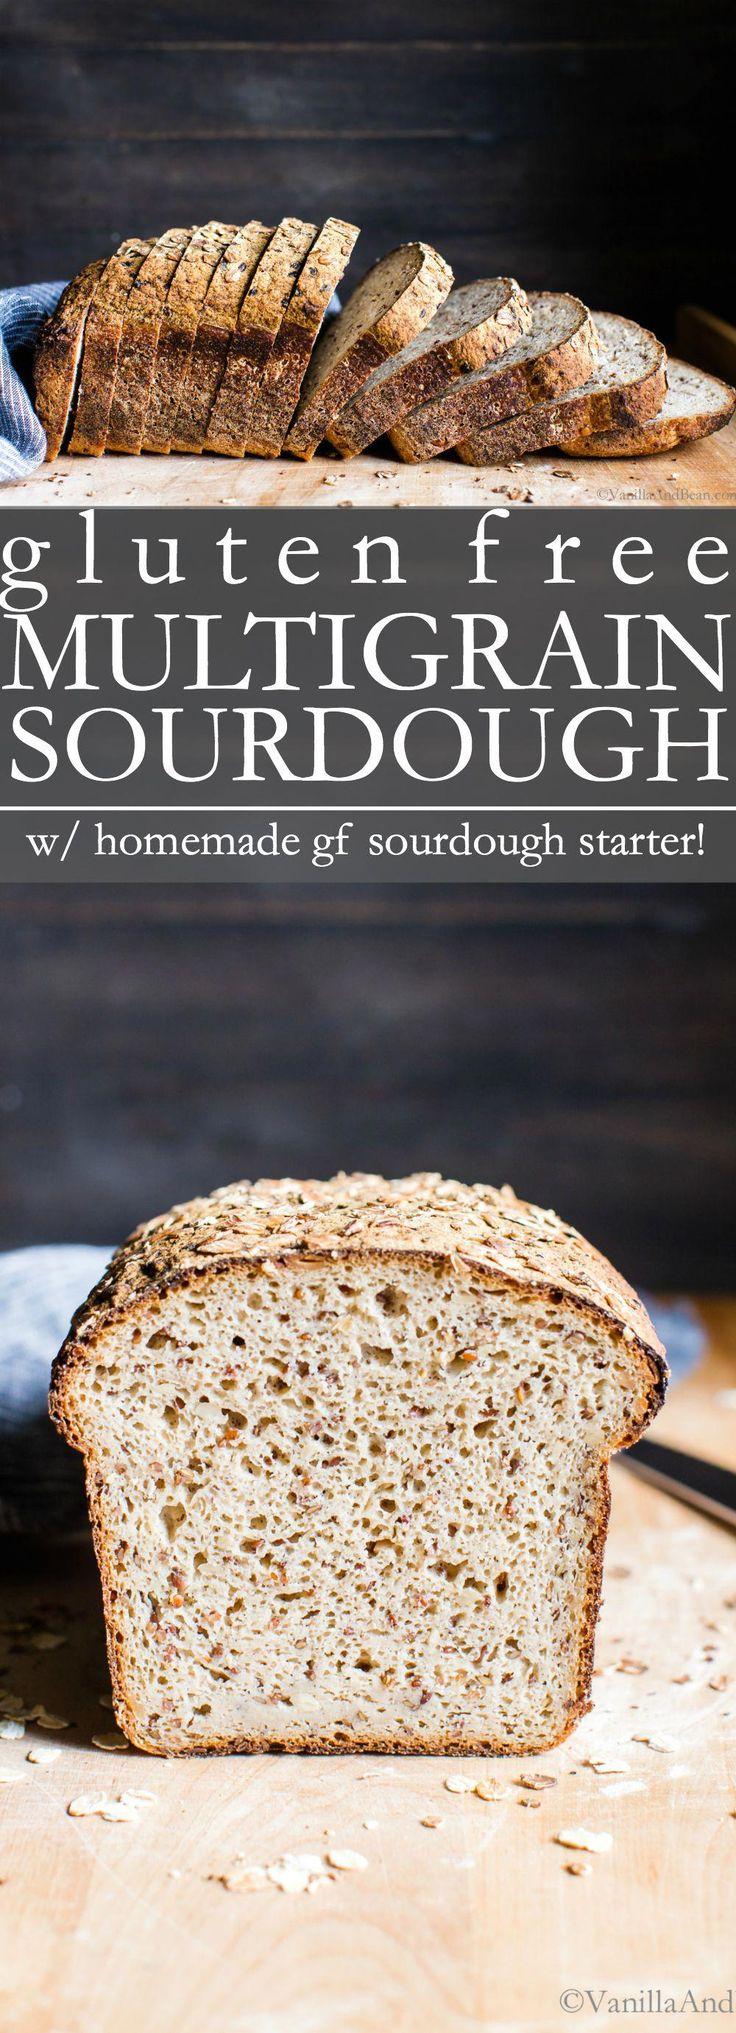 Keto Bread Recipe For Bread Makers KetoFriendlyBread in